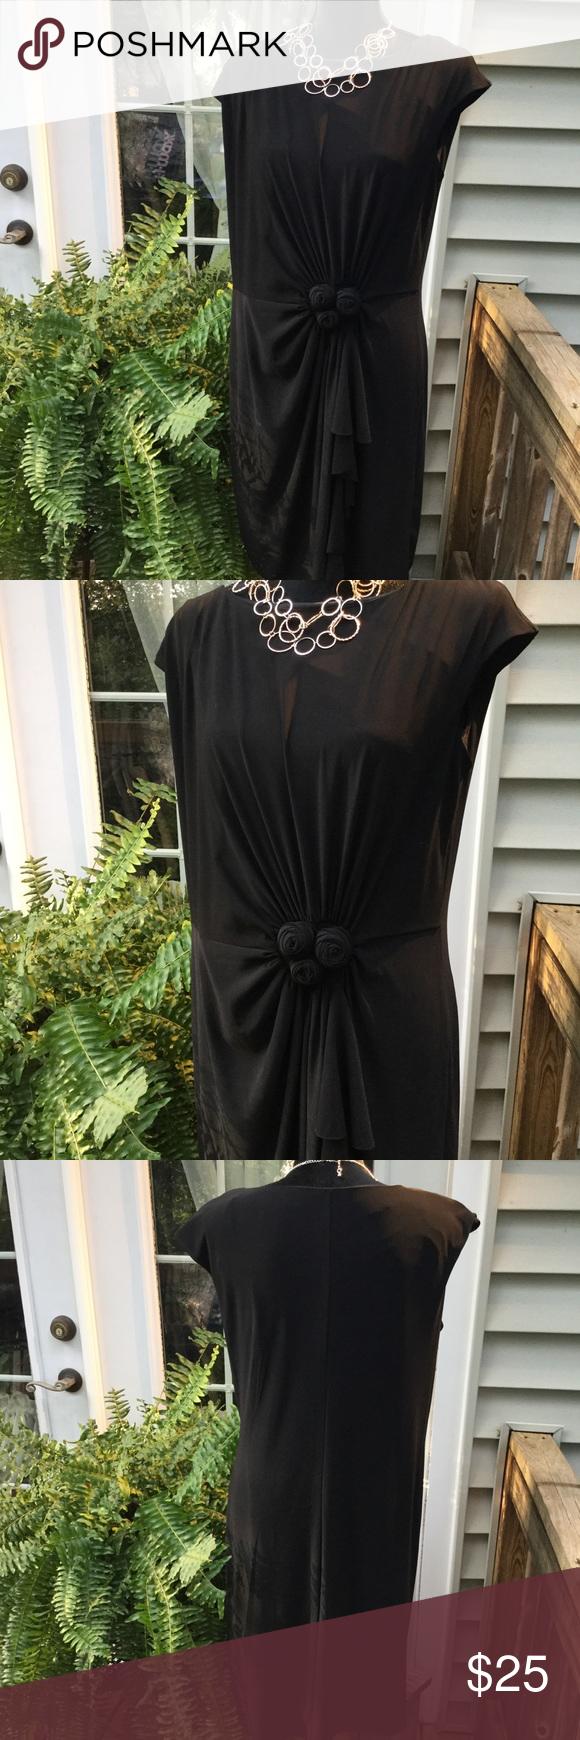 Ronni Nicole Little Black Dress Size 16 Little Black Dress Black Dress Size 16 Dresses [ 1740 x 580 Pixel ]